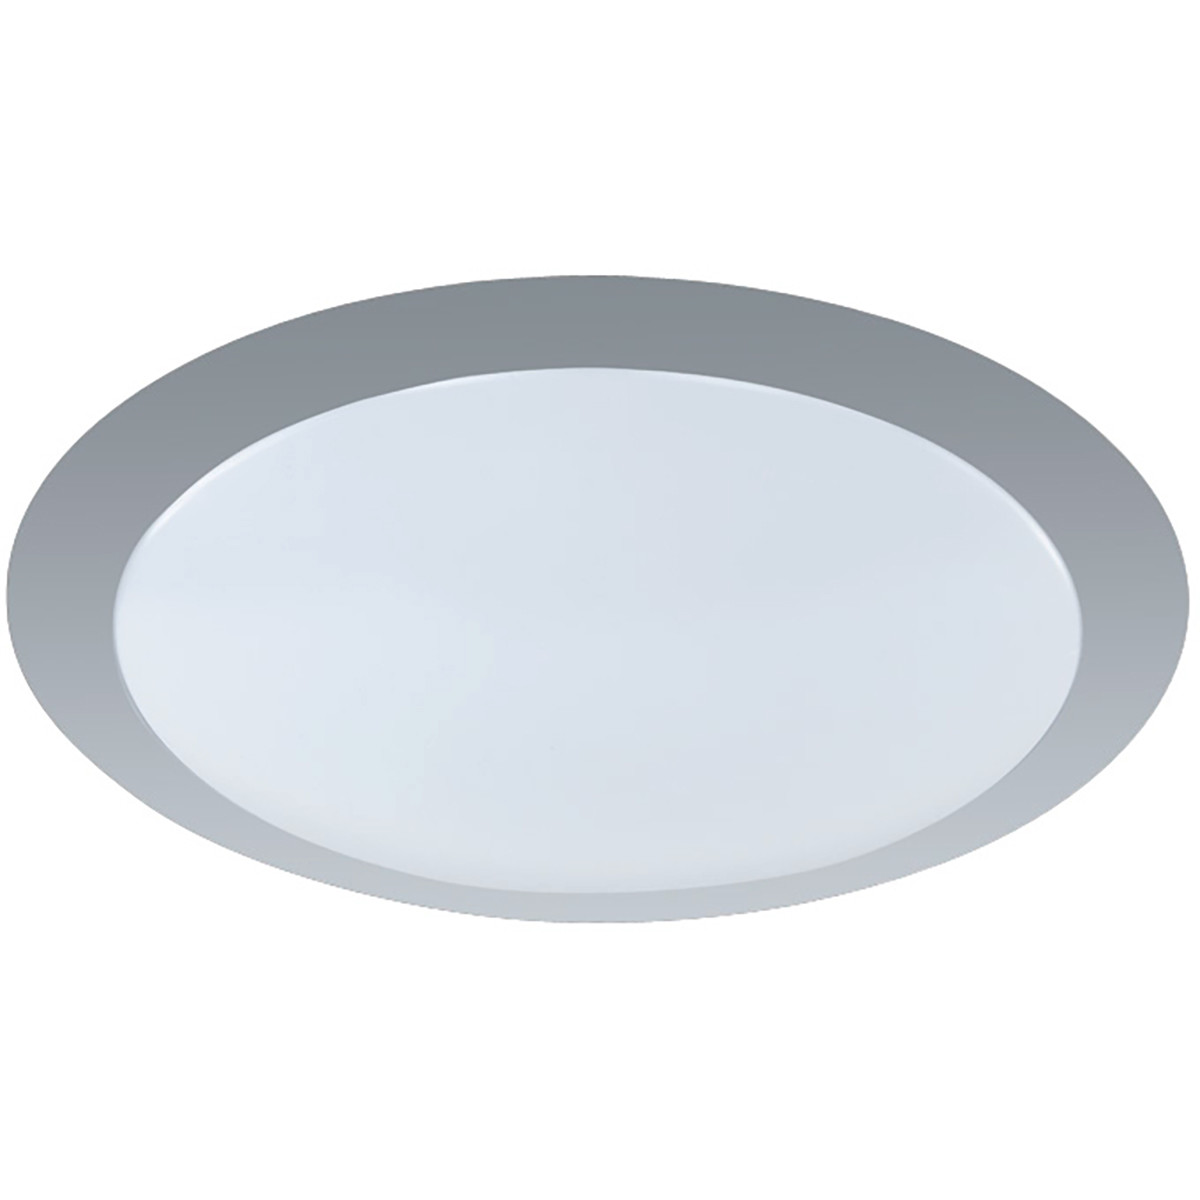 LED Plafondlamp - Plafondverlichting - Trion Ginzon - 12W - Warm Wit 3000K - Rond - Mat Titaan - Alu